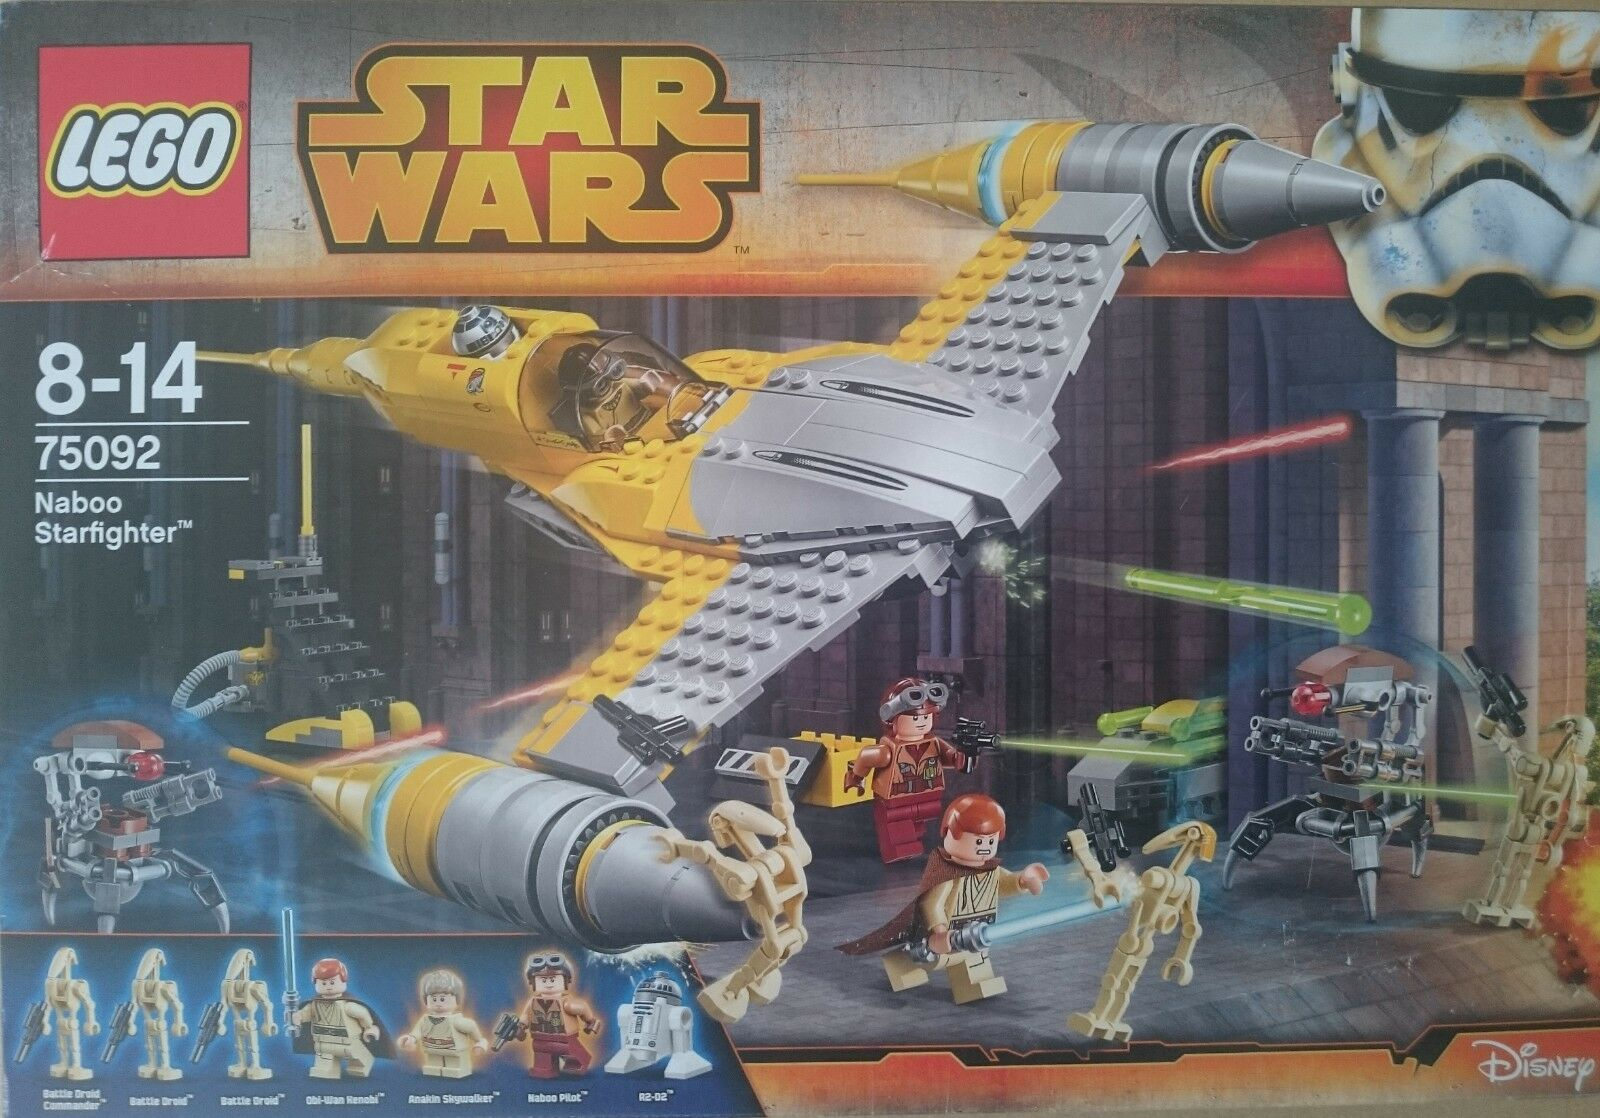 LEGO 75092 STAR WARS NABOO STARFIGHTER. NUEVO